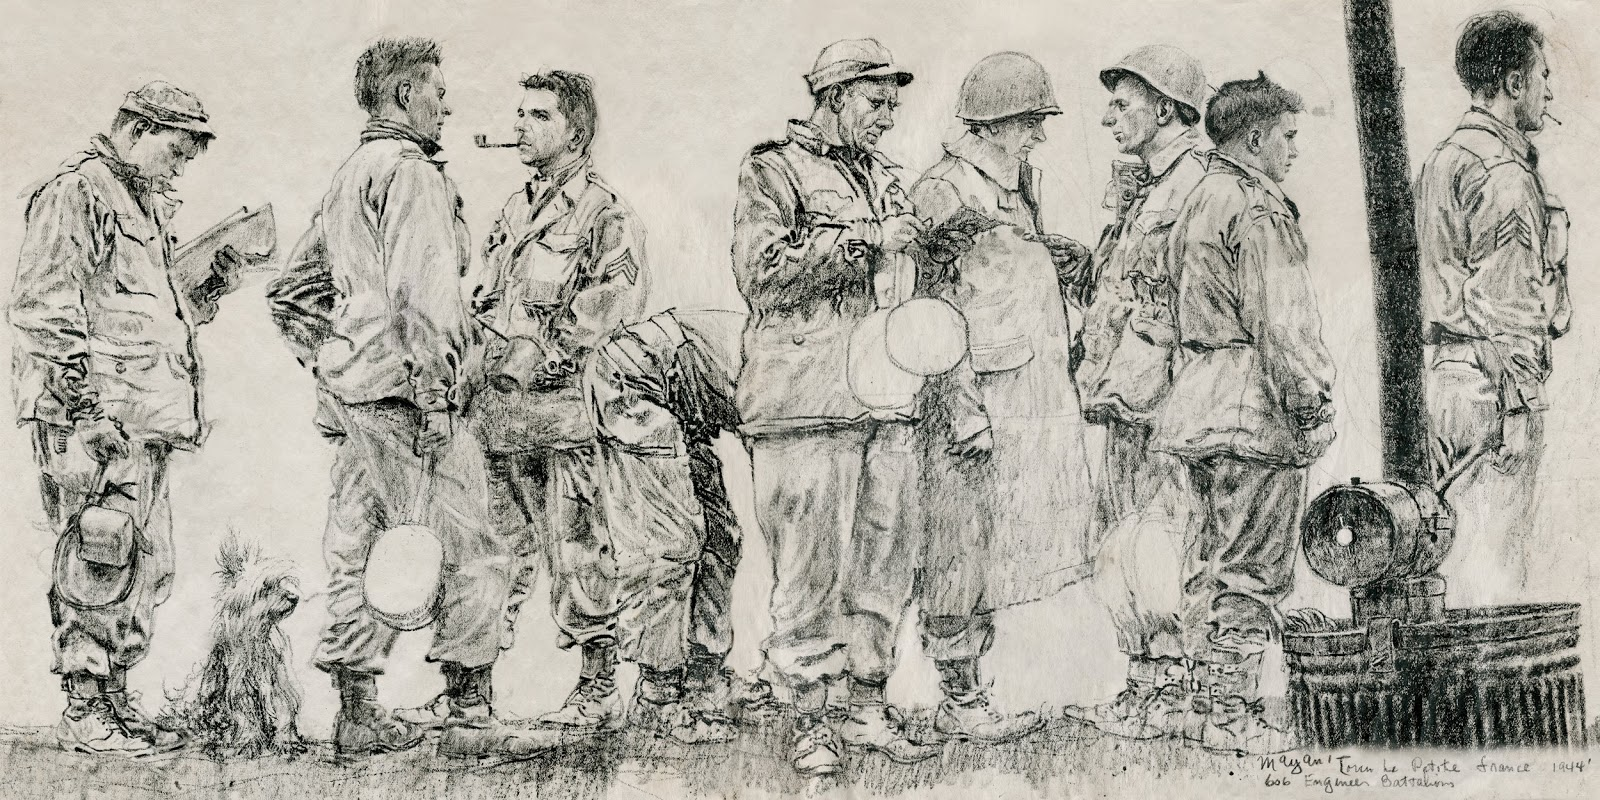 Gurney Journey: Earl Mayan's World War II Drawings